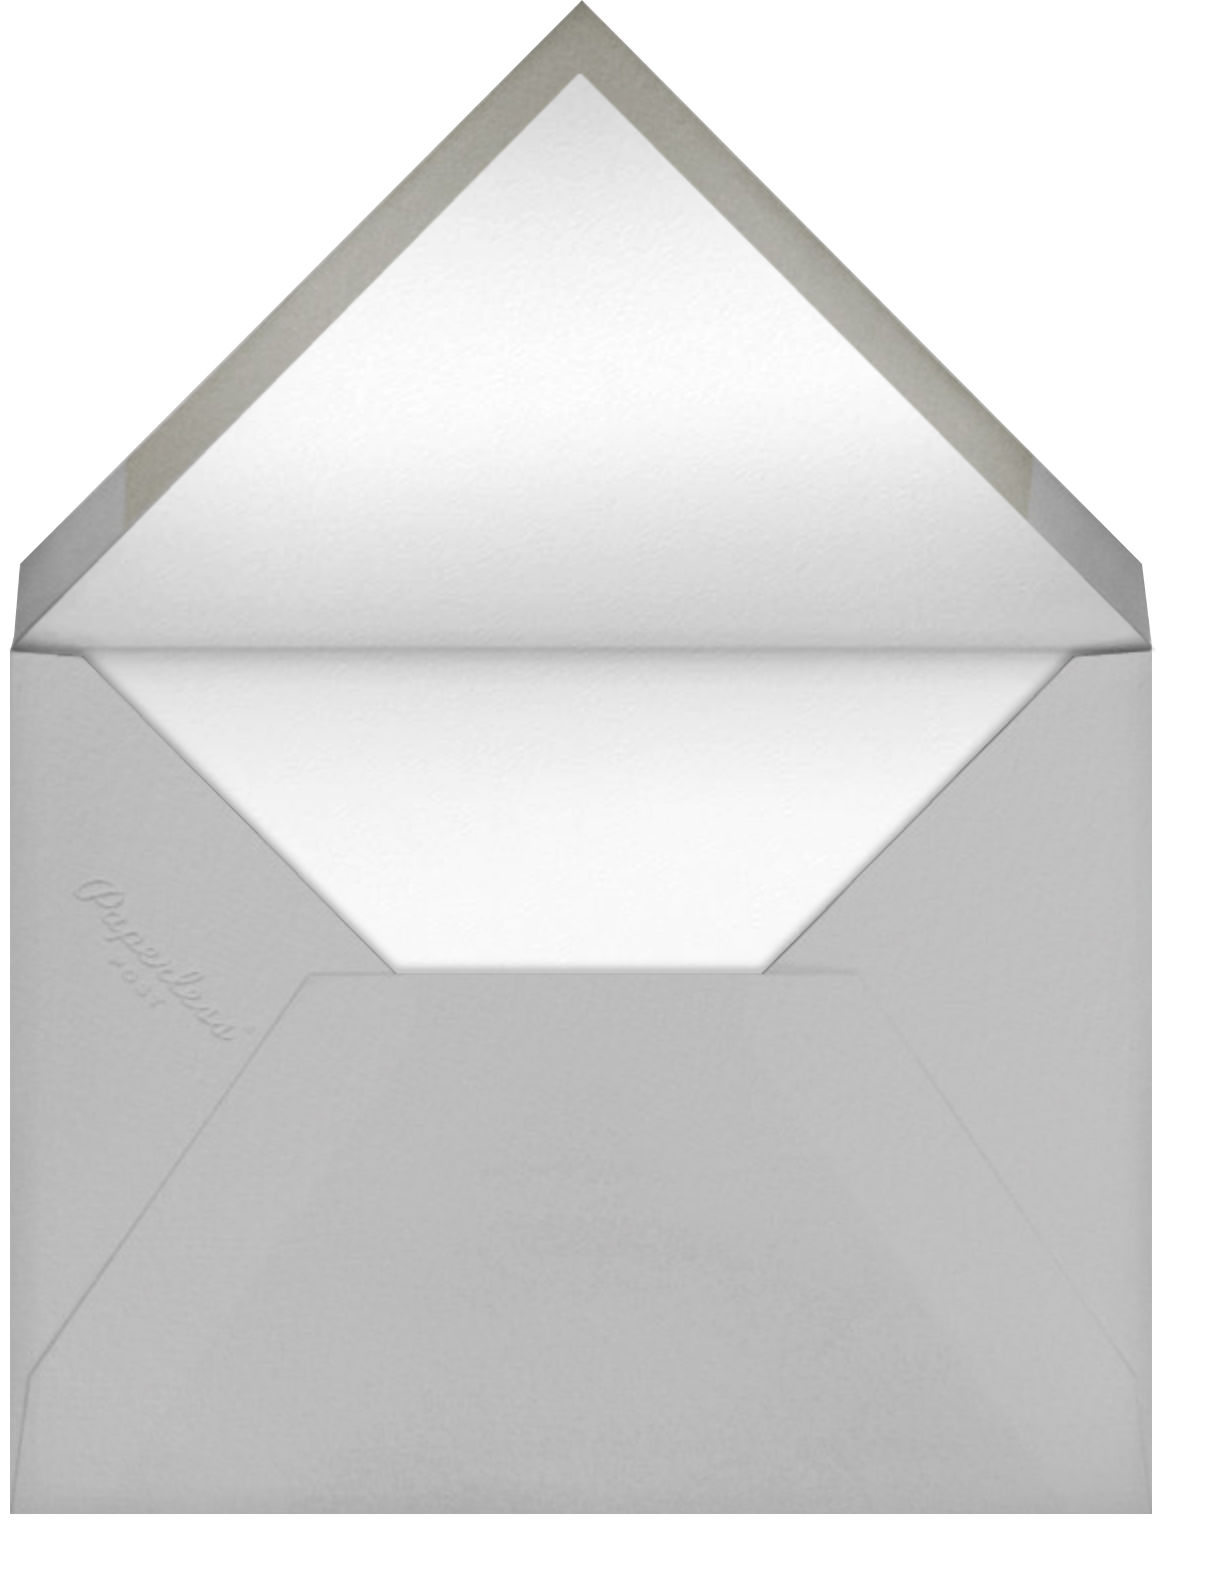 Lina - Winter Gray - Paperless Post - Photo  - envelope back